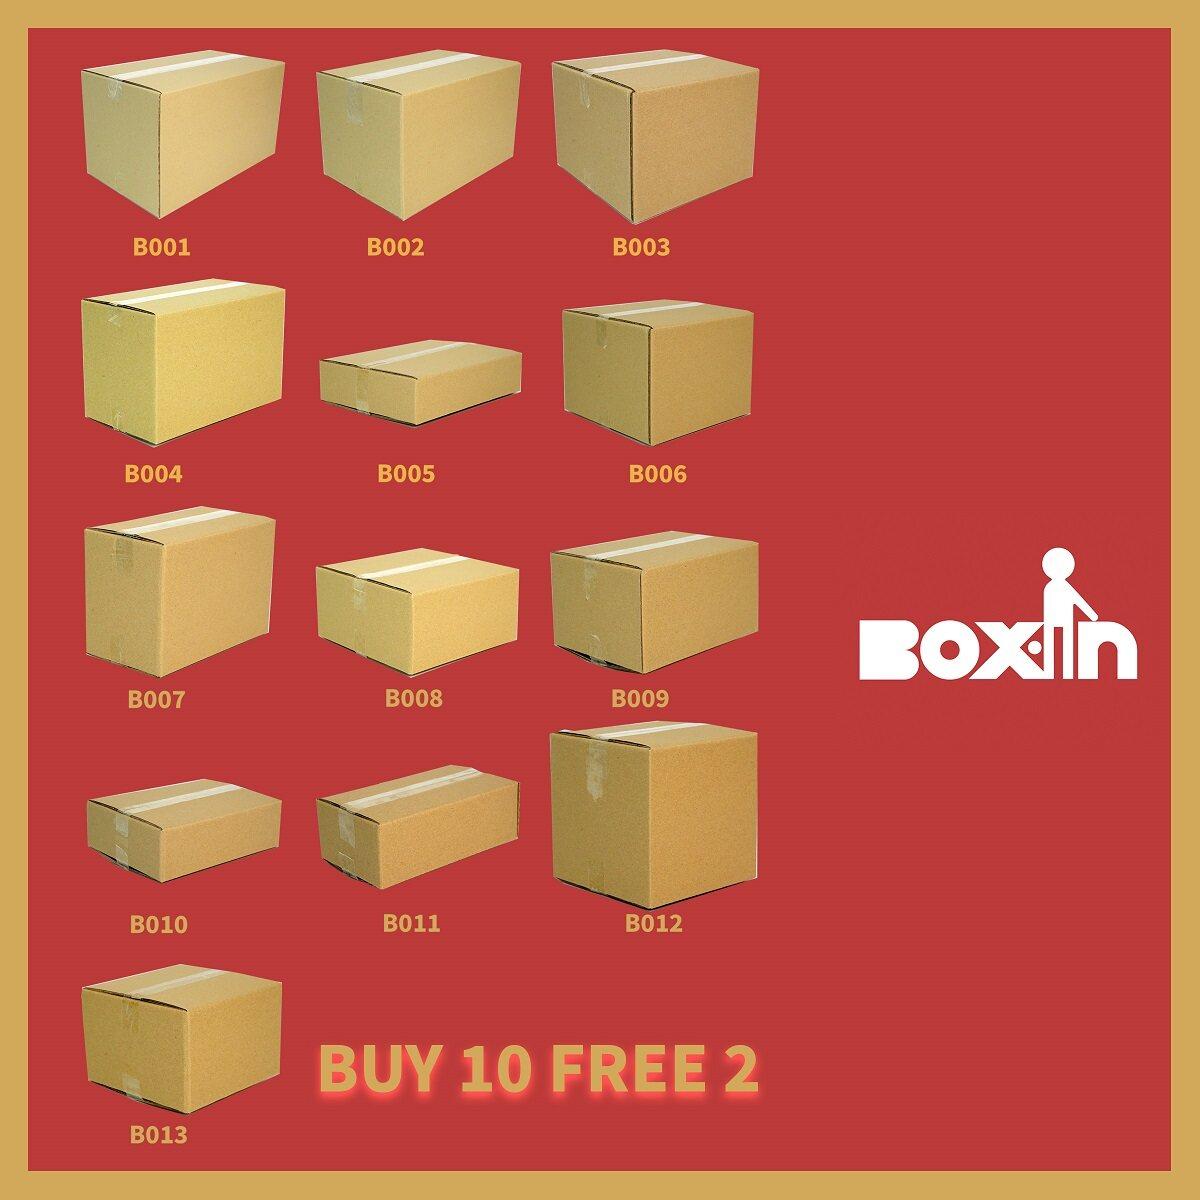 (Buy 10 free 2) Carton Box / Pizza Box / Packaging Box / Storage Box / Kotak / House Moving [Box.In]Brown B007 210*110*140mm 1pc